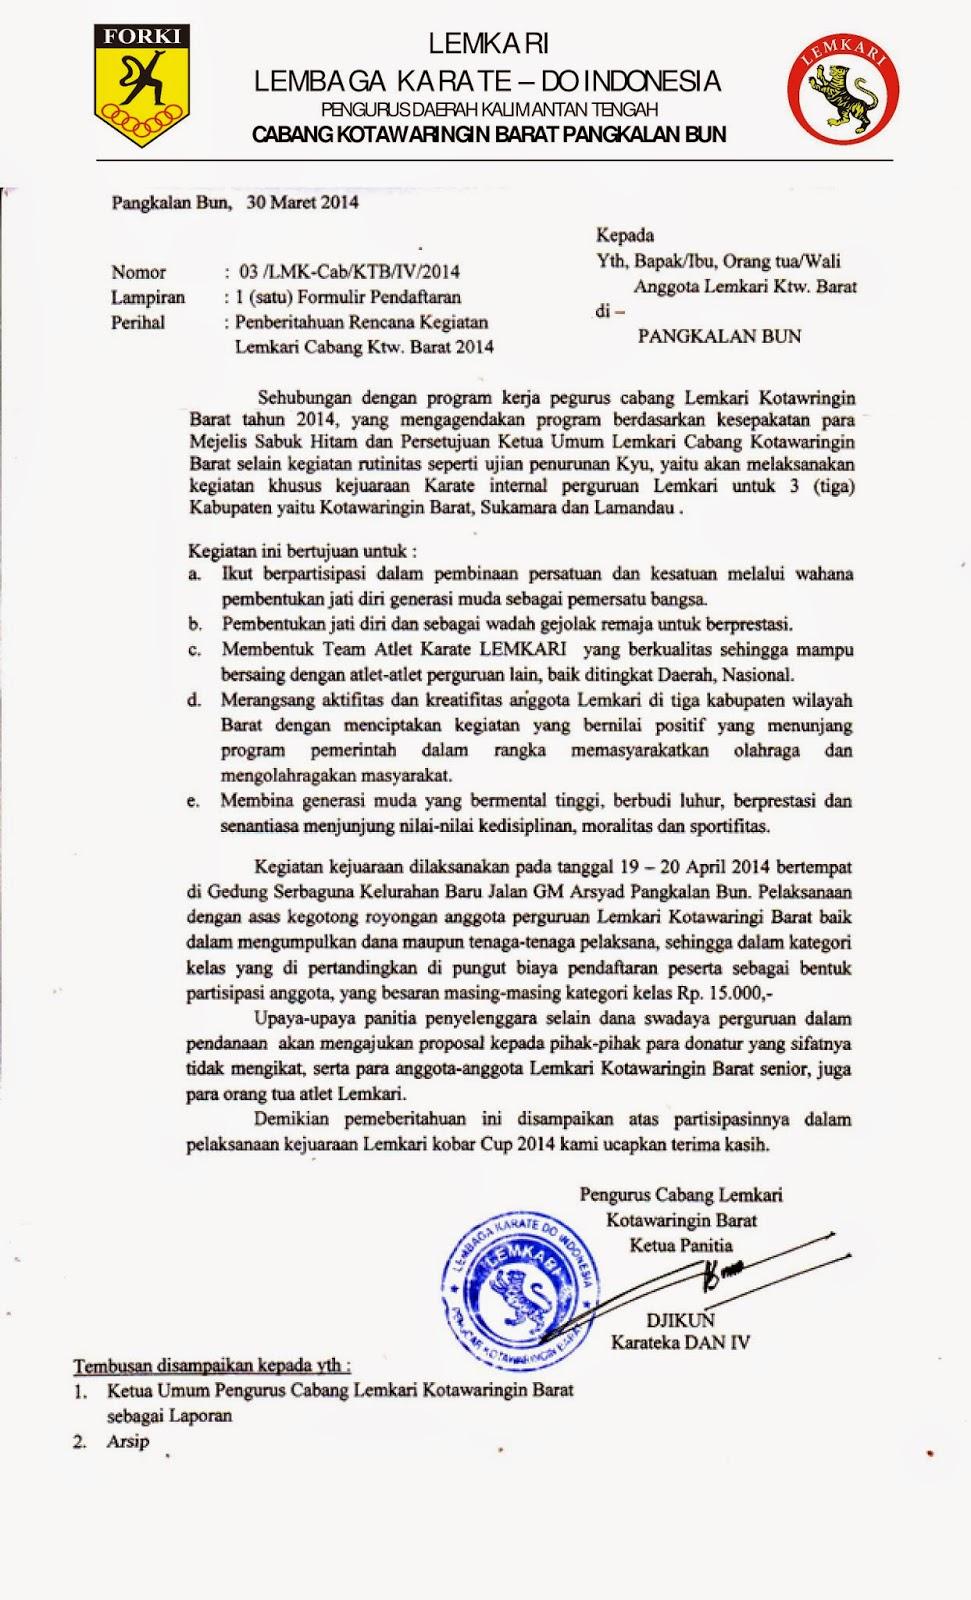 Lemkari Kotawaringin Barat Maret 2014